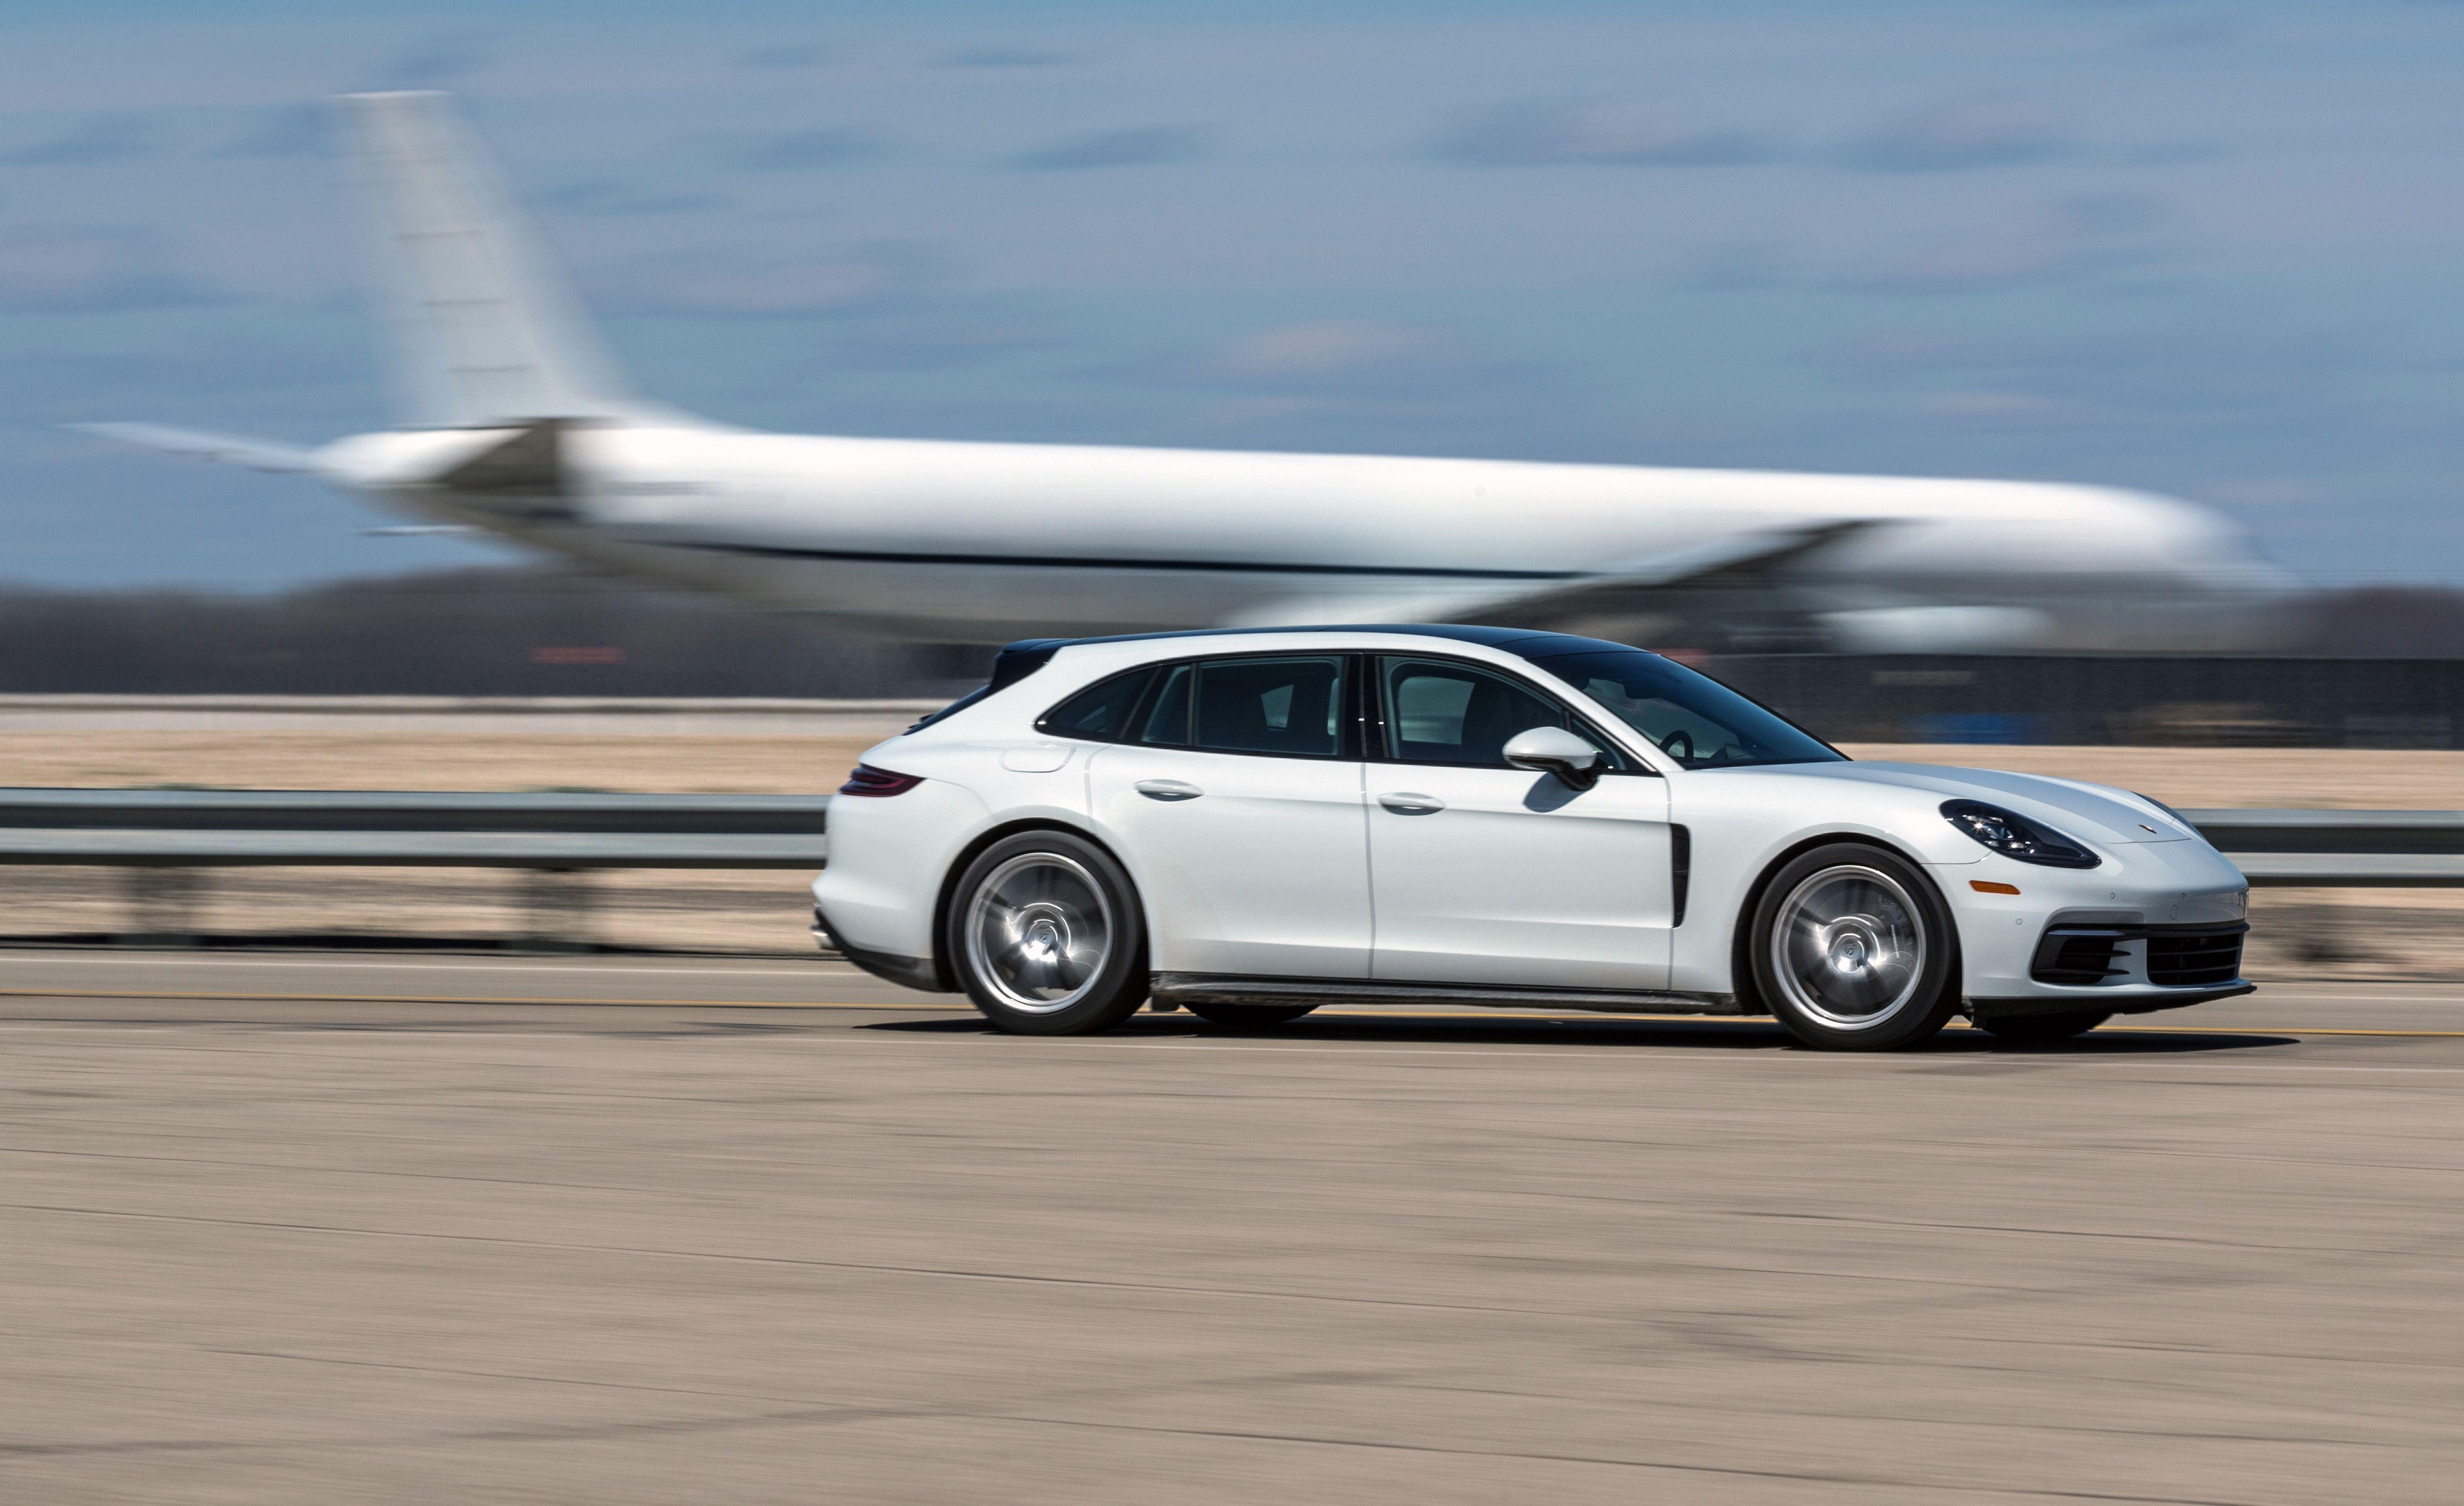 2018 Porsche Panamera 4 and 4S Sport Turismo \u2013 Wicked Wagons